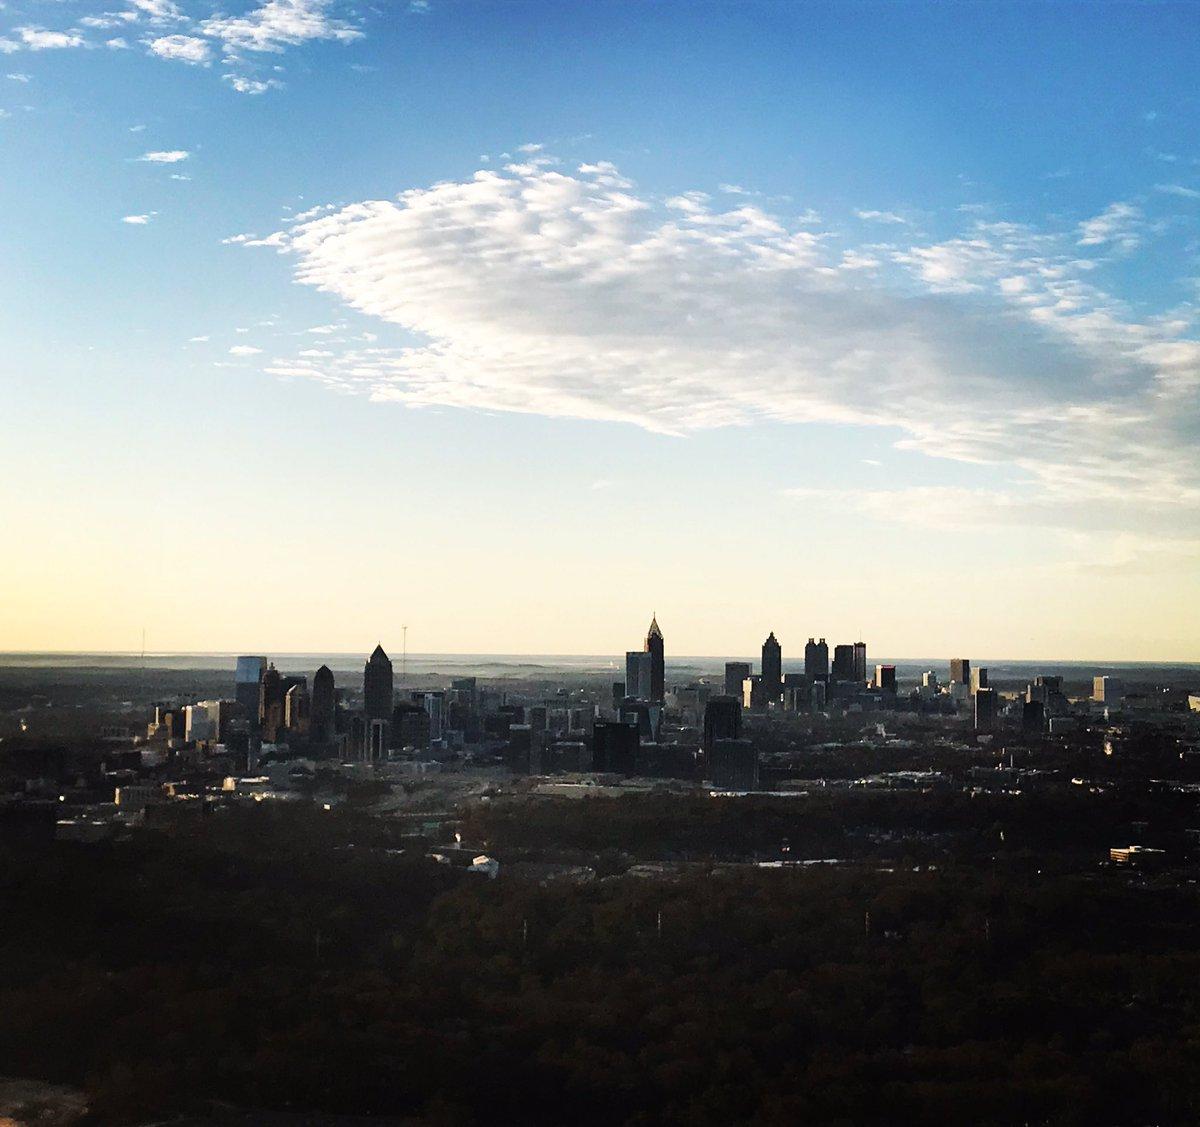 High clouds giving some #shade this morning over Downtown #atlanta @wsbradio #skycopter @wsbtv #captncam